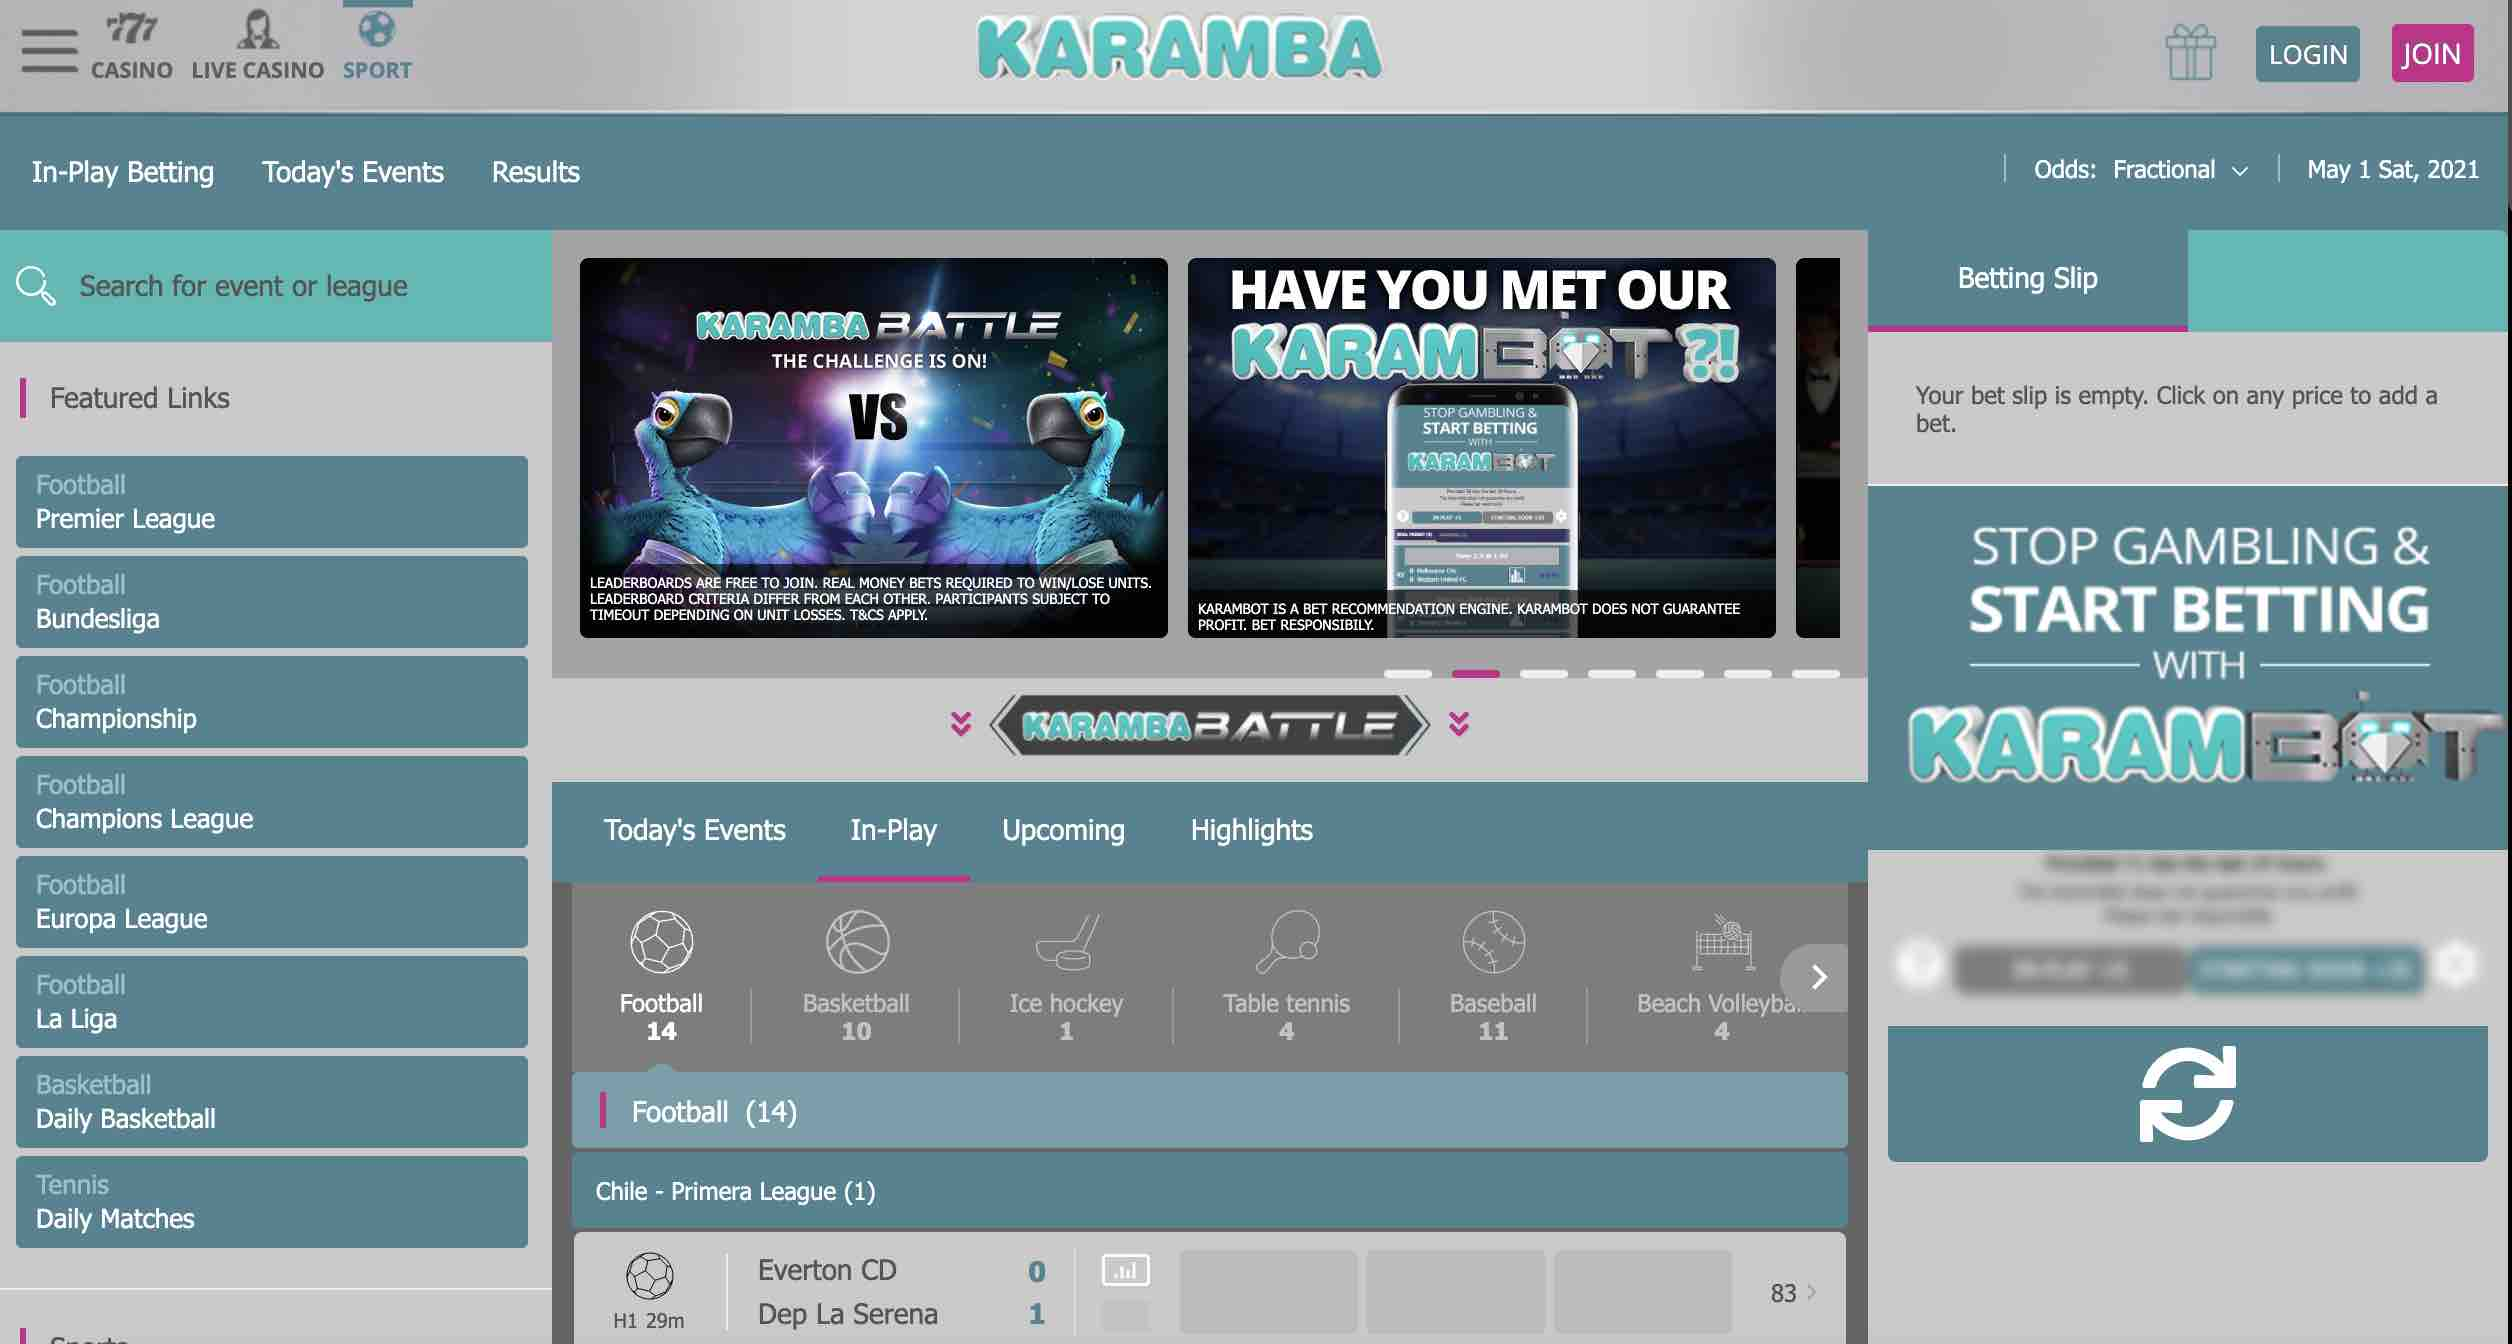 Karamba Casino Slots and Sports